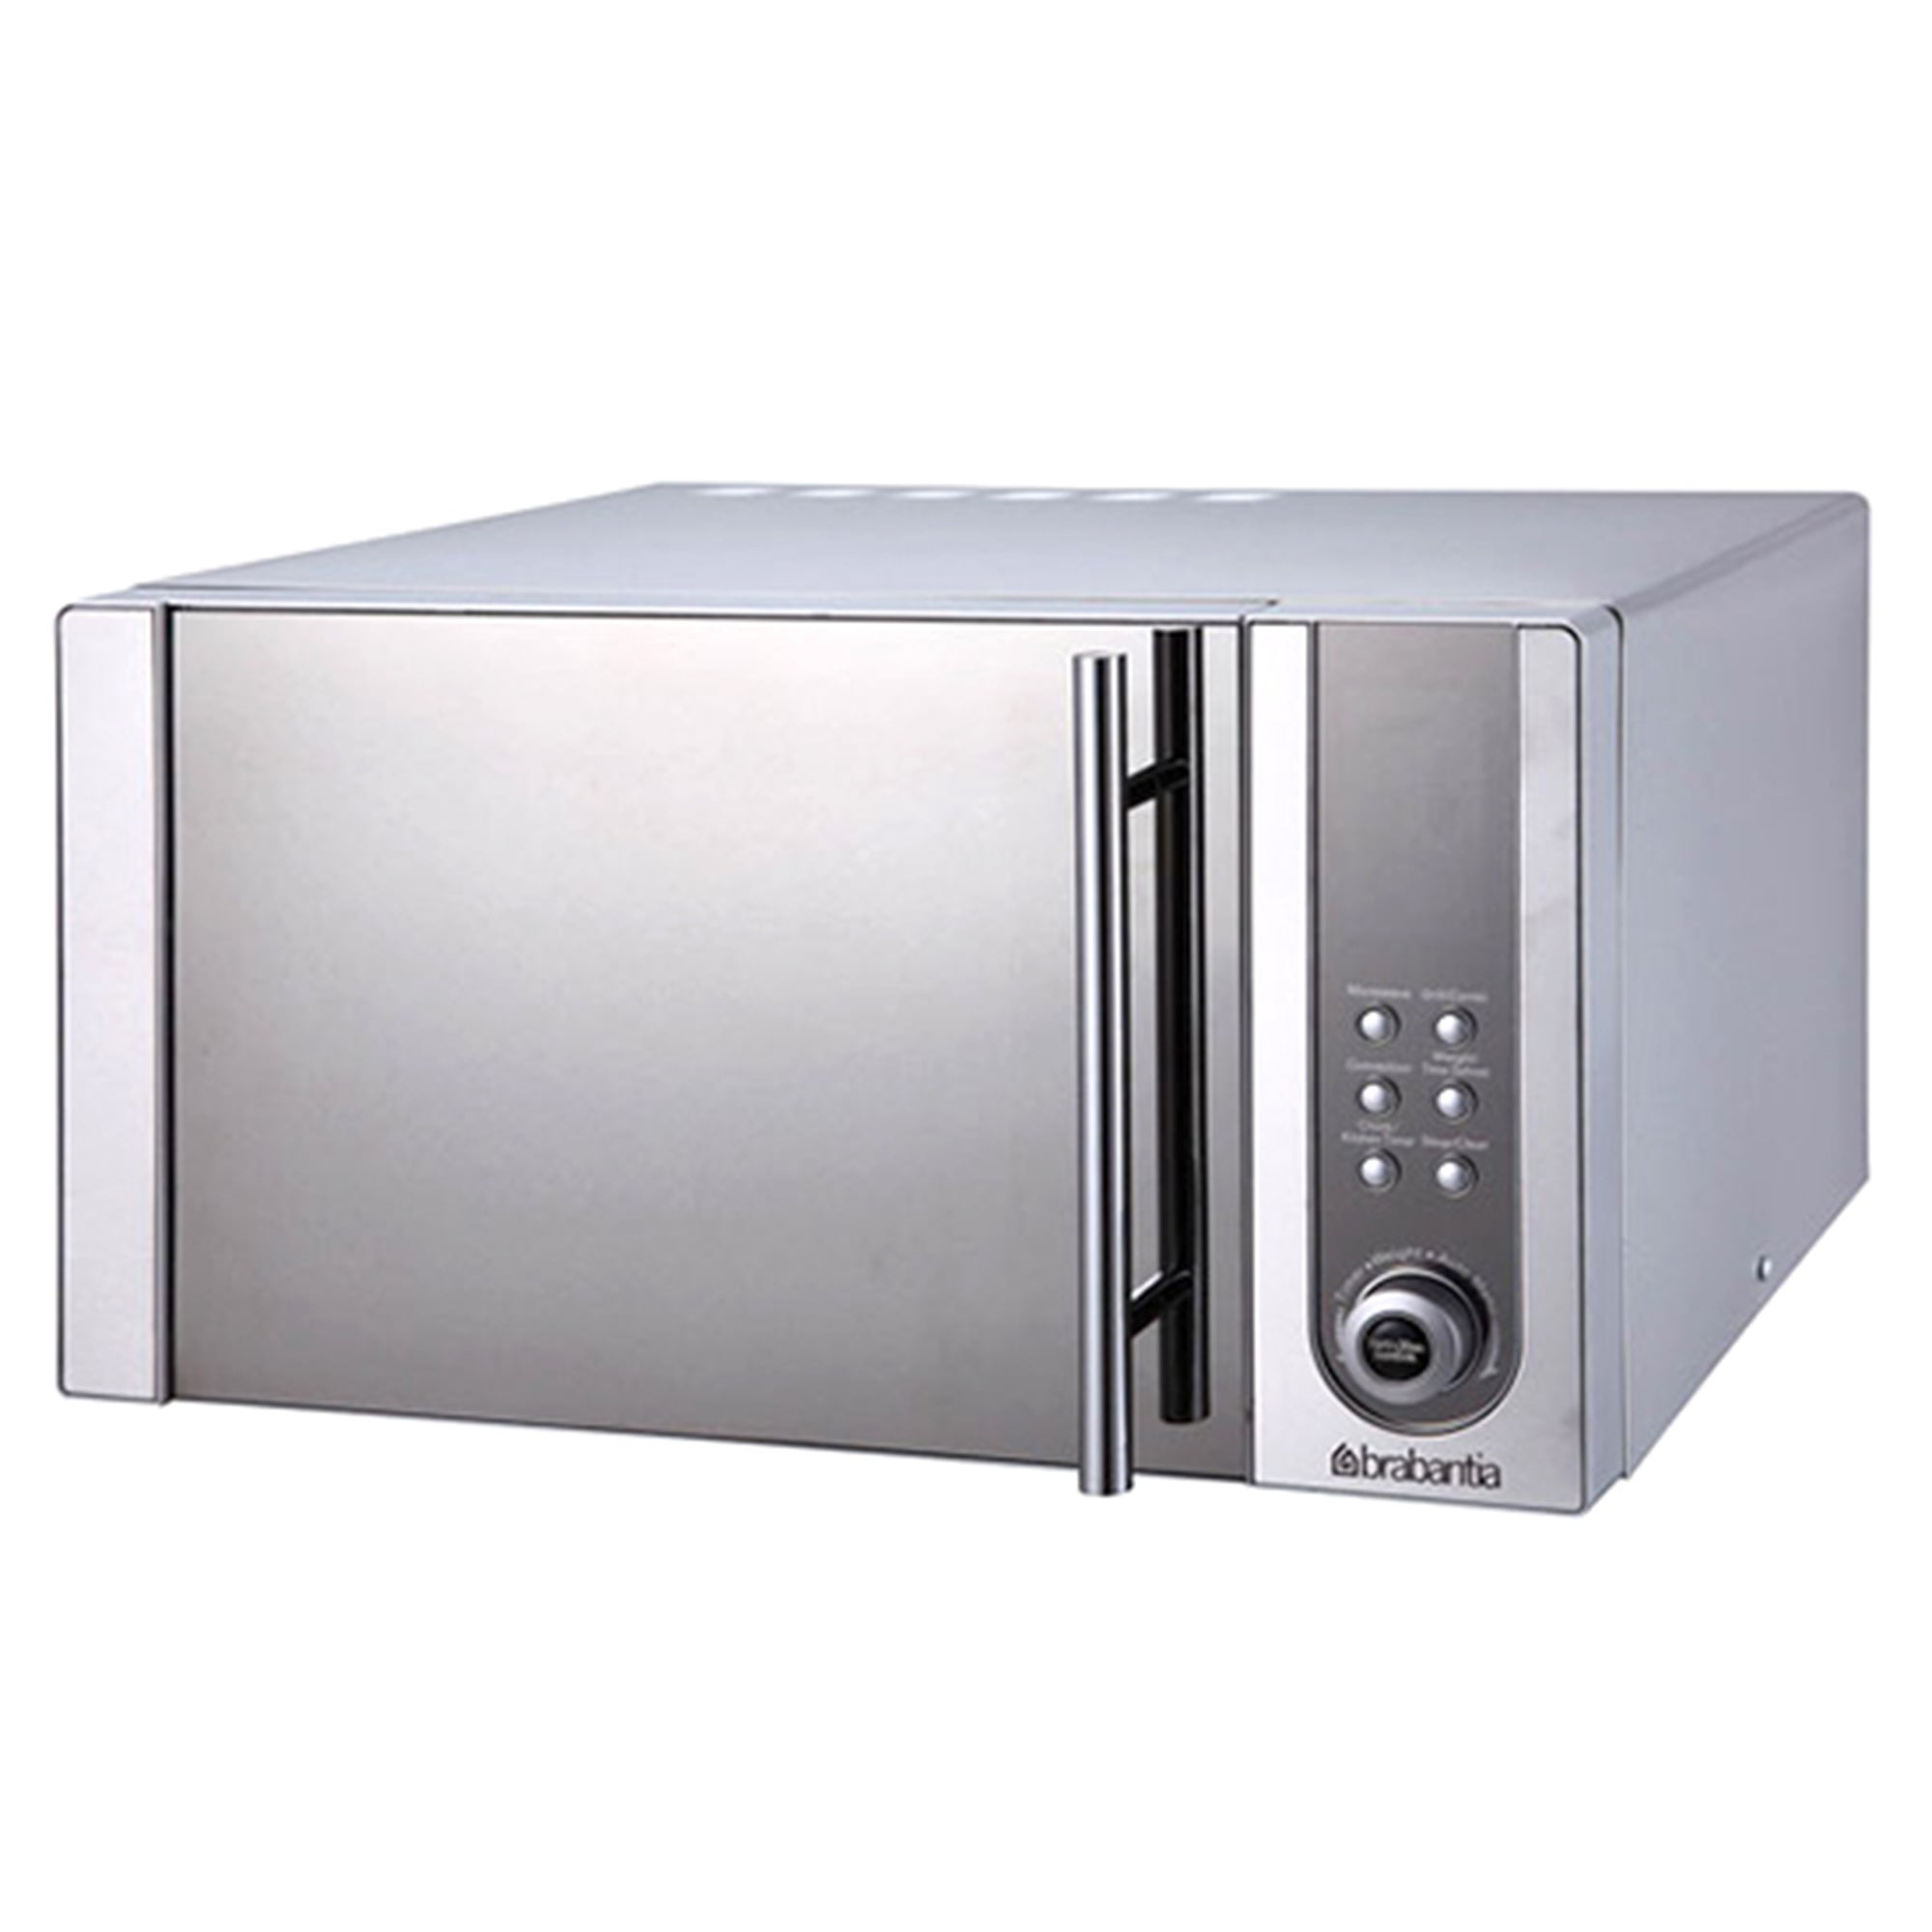 Microwaves Dunelm On Costcrawler Co Uk